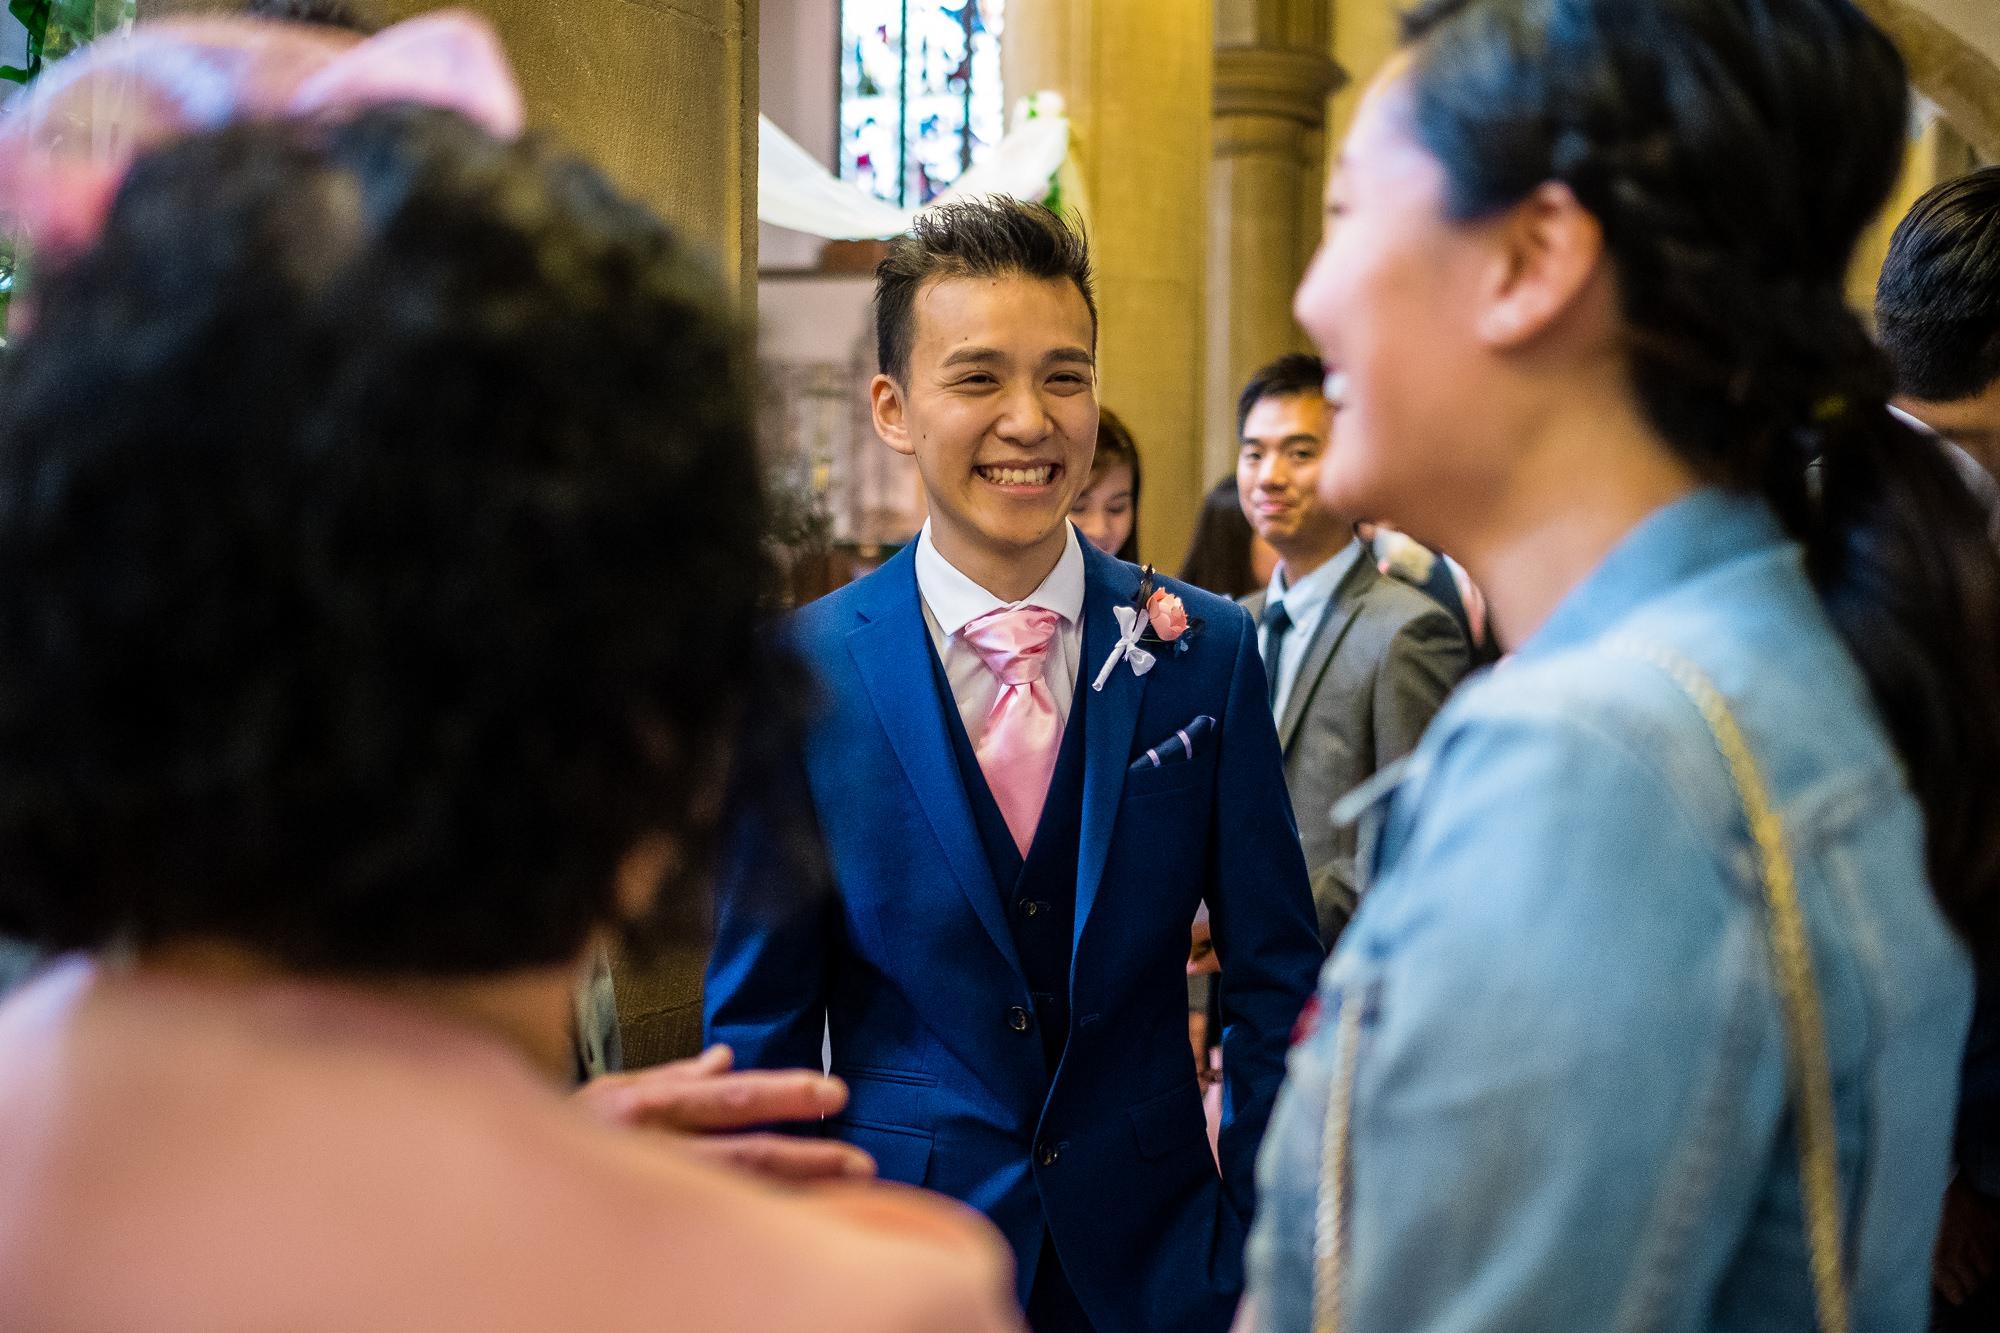 groom greeting guests at church